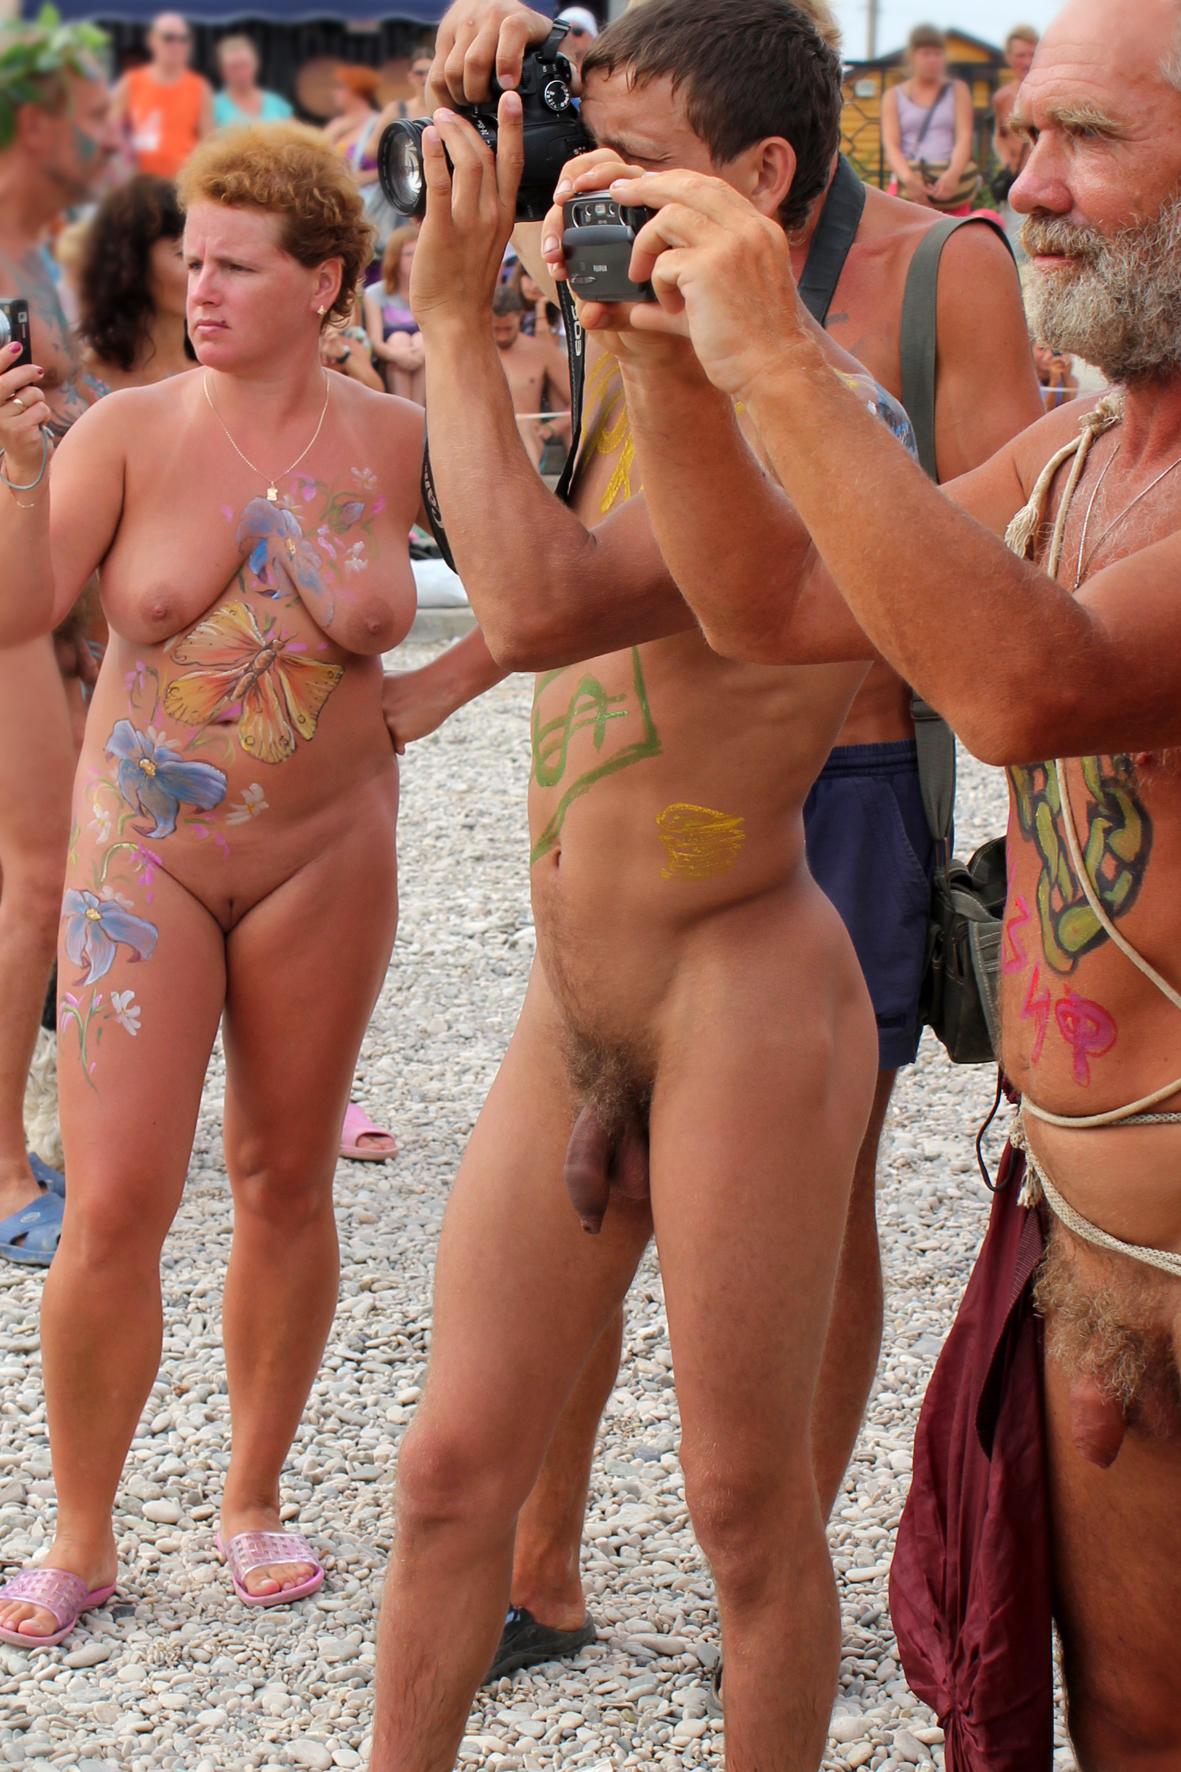 konkursi-nudistov-onlayn